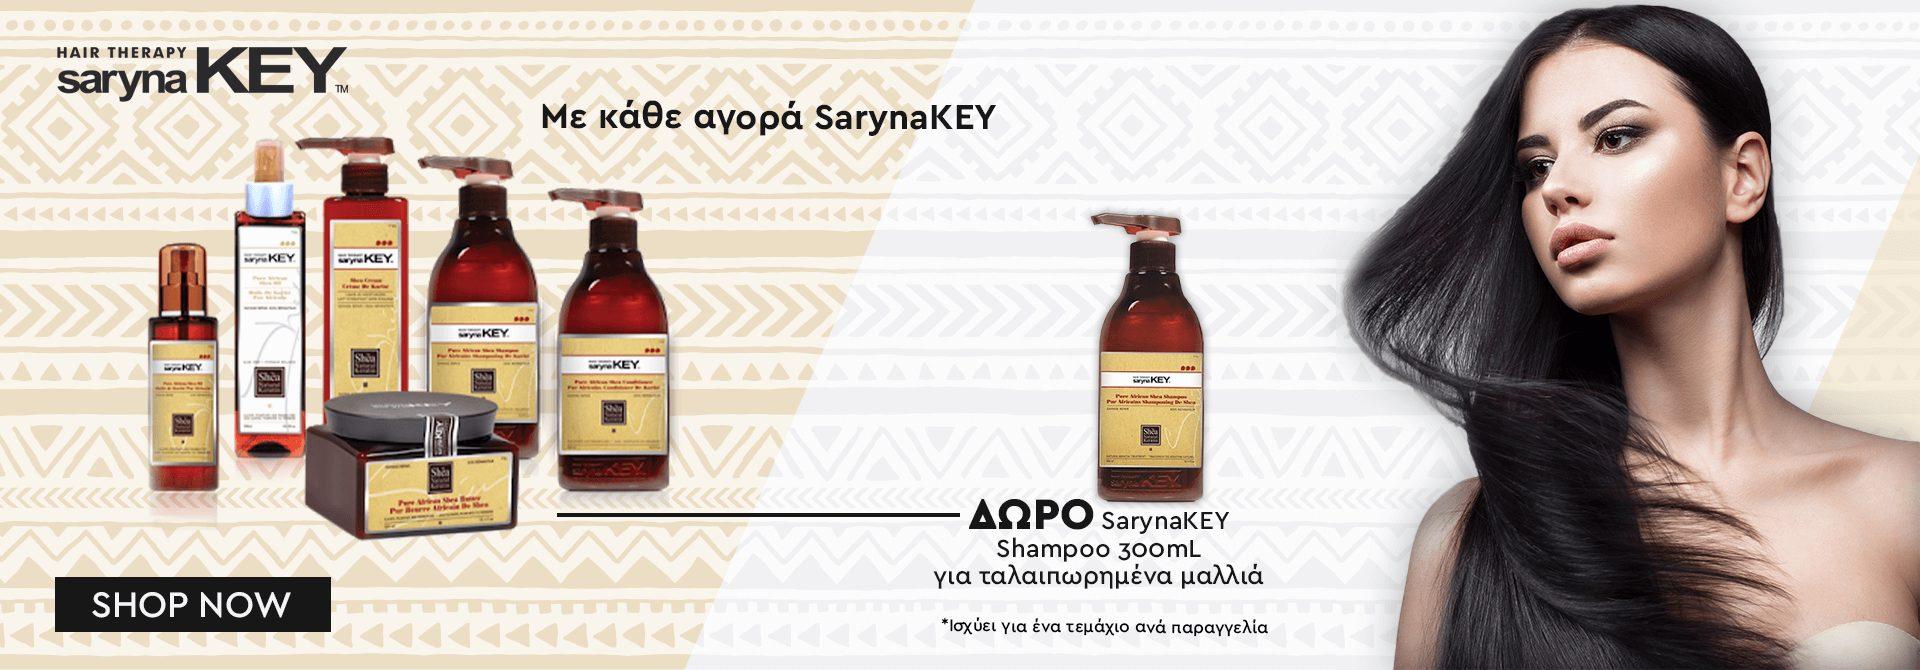 Saryna Key - Summer - Offer - Προσφορά - Δώρο - Gift - Le tif Beauty Shop